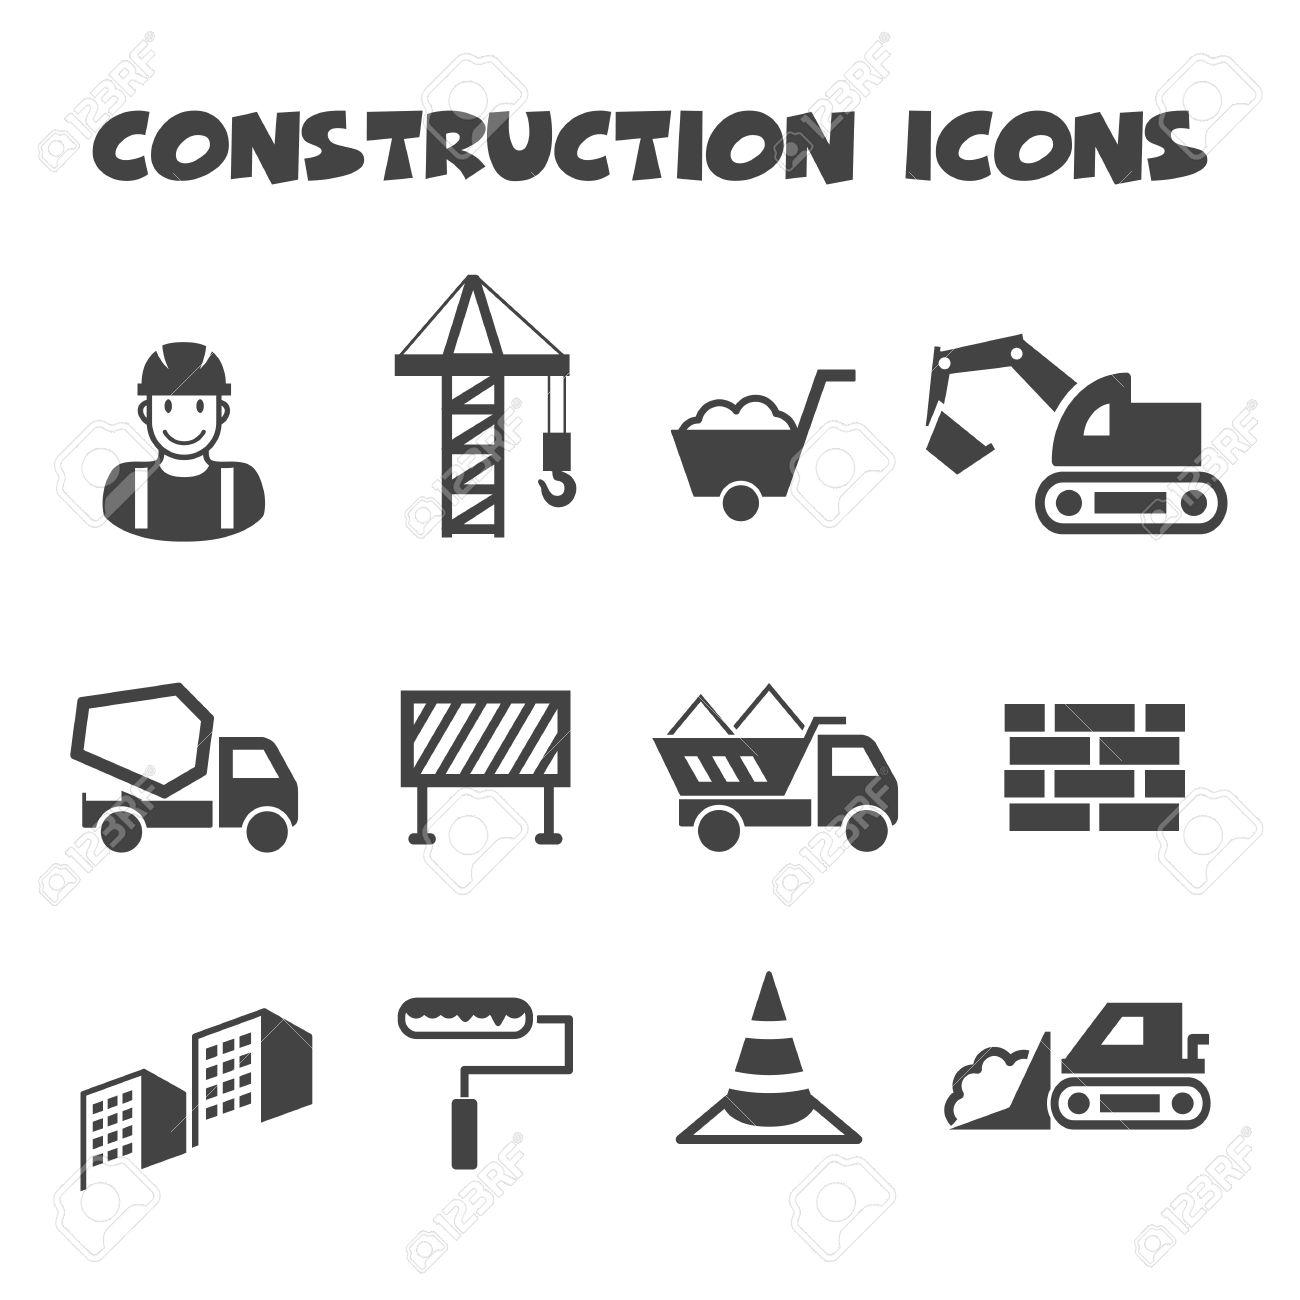 Construction Icons Mono Vector Symbols Royalty Free Cliparts